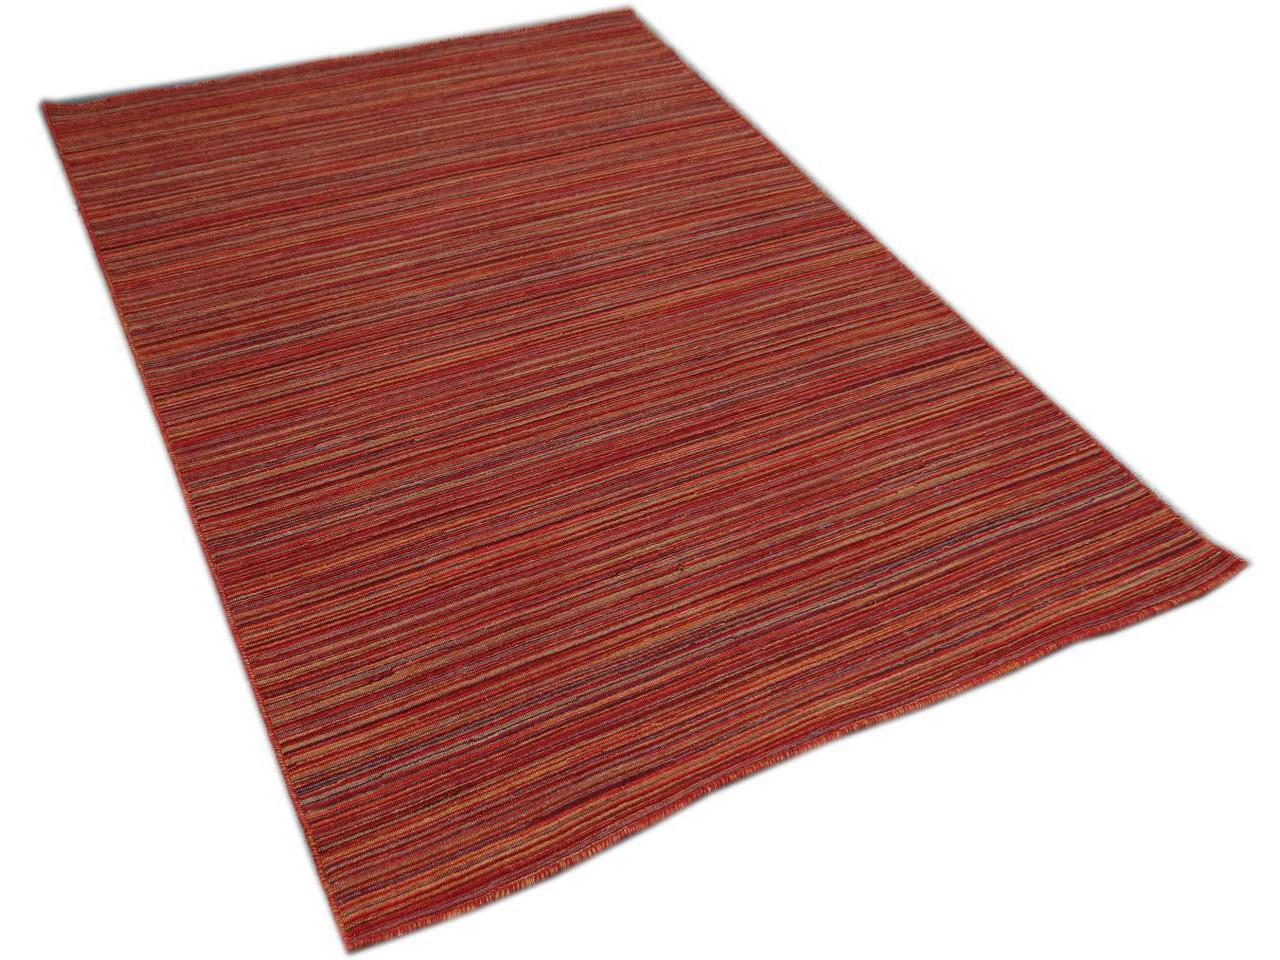 tapis kilim pas cher carrelage design tapis kilim pas cher moderne design les tapis tapis pas. Black Bedroom Furniture Sets. Home Design Ideas